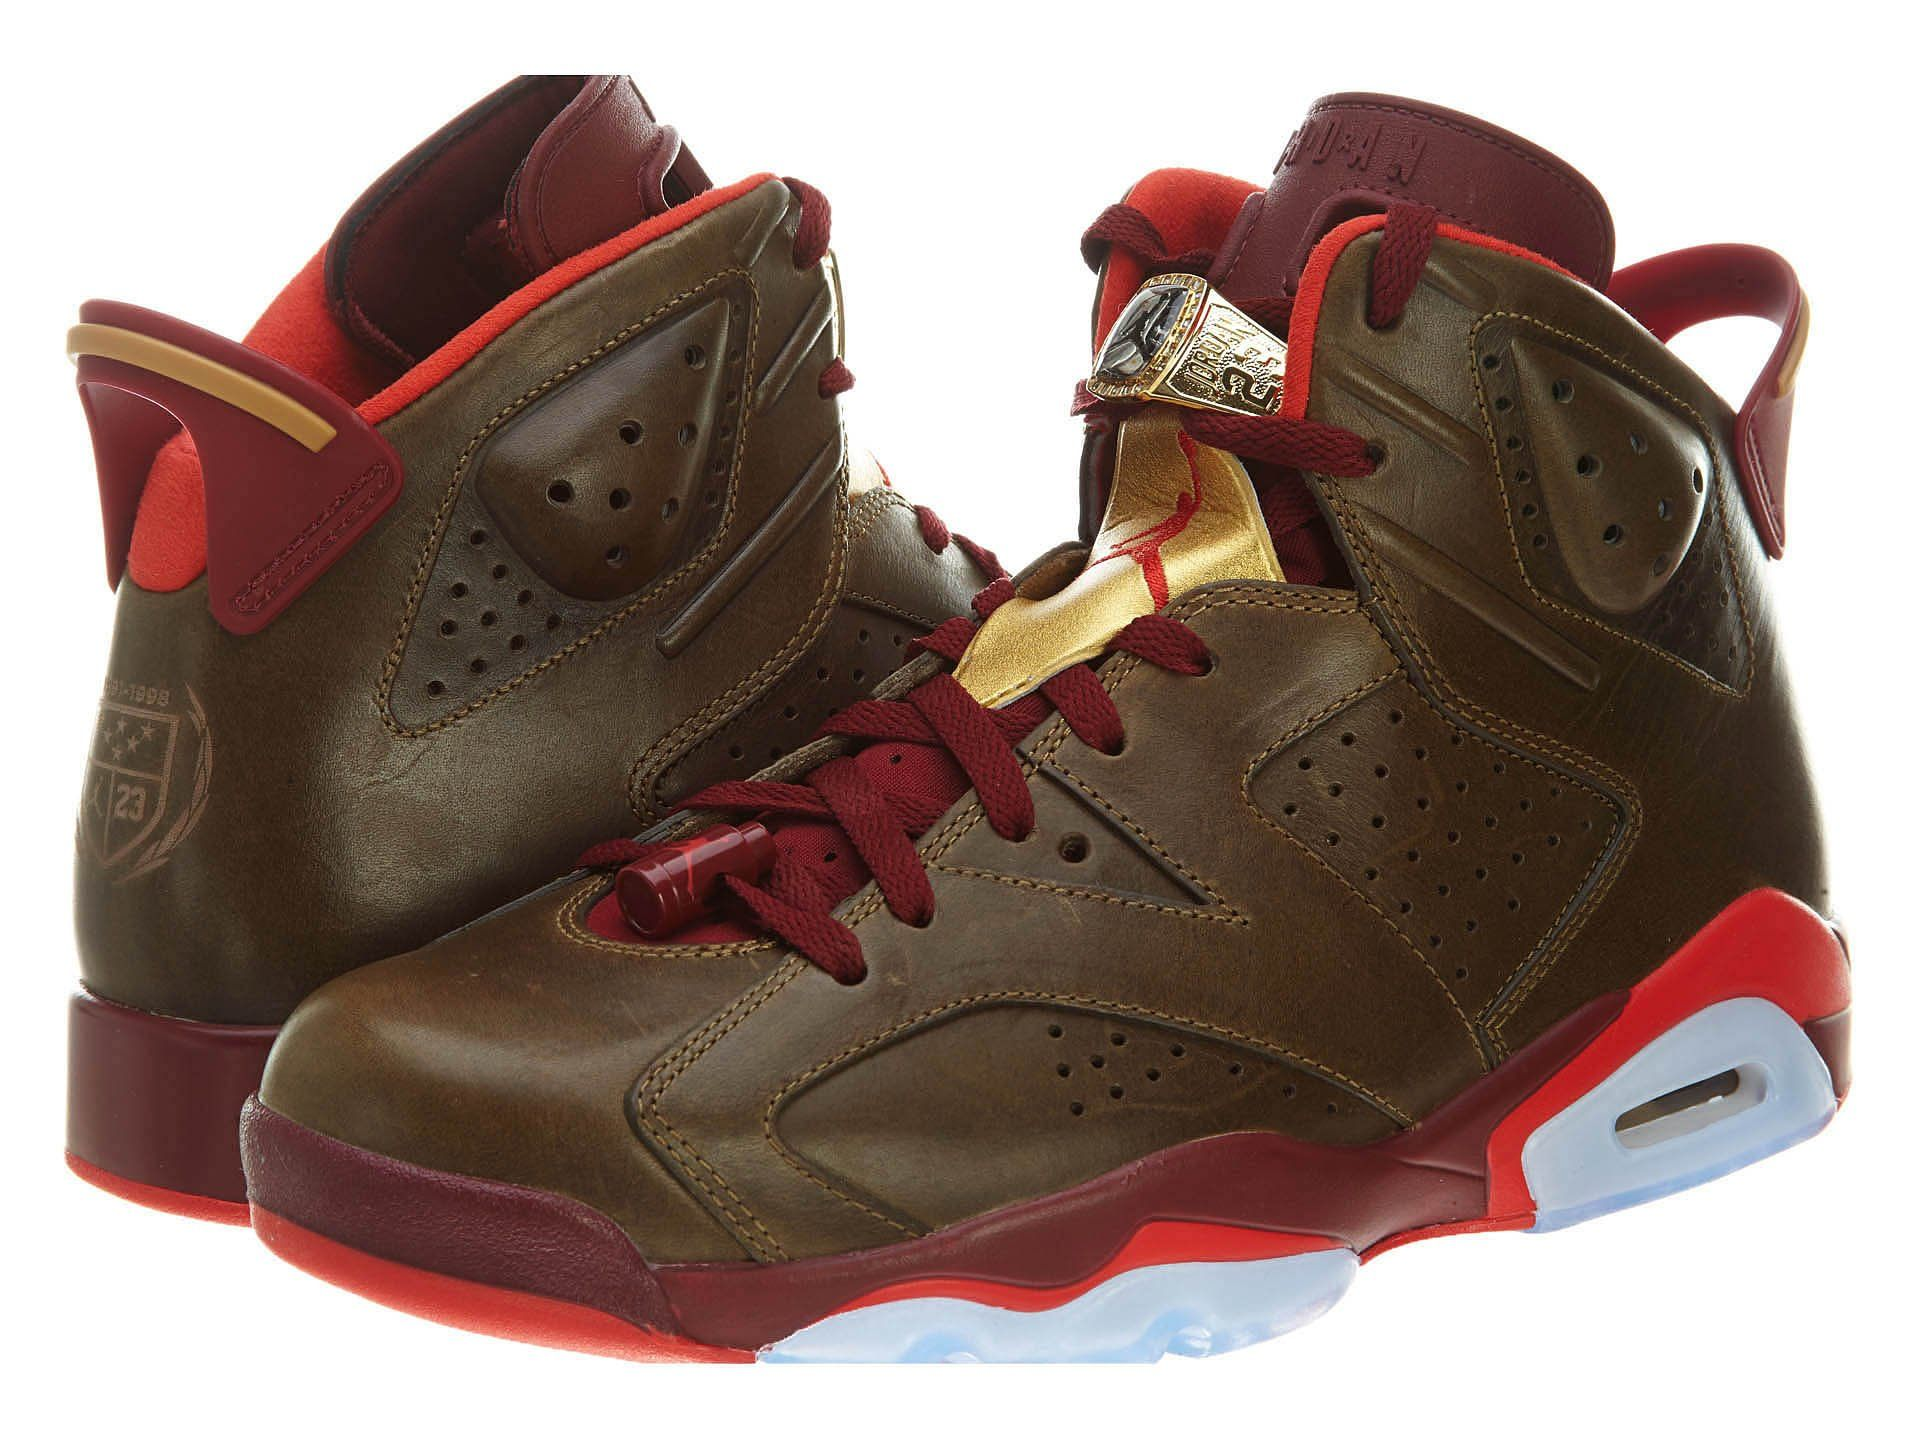 half off 34fc6 c8879 Amazon.com  Jordan Mens Air Jordan 6 Retro Leather basketball-shoes  Shoes